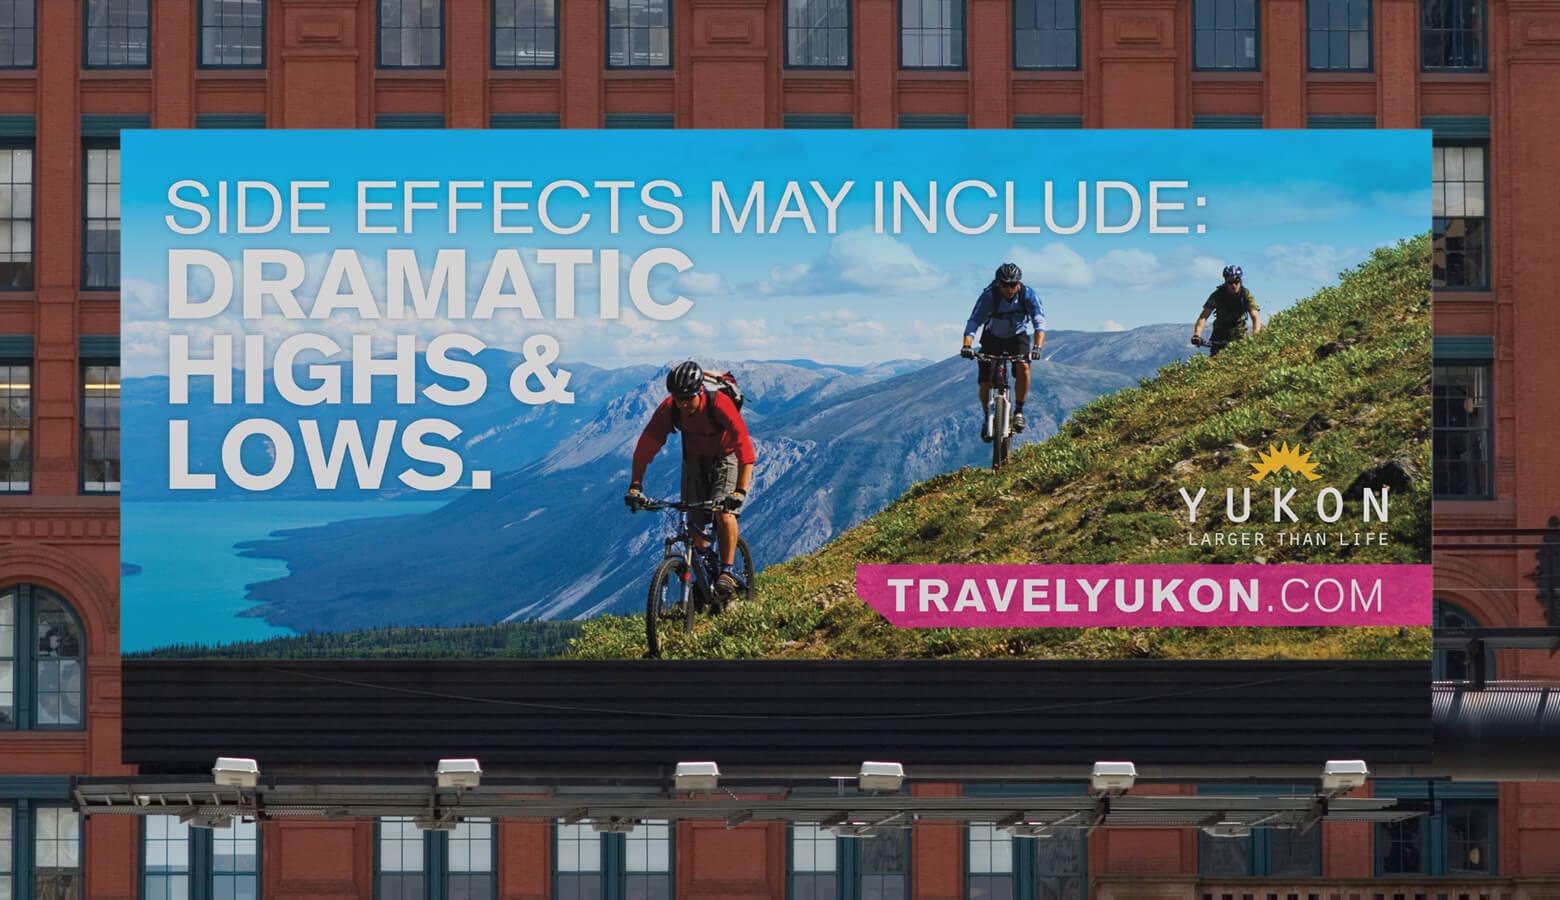 Yukon Tourism